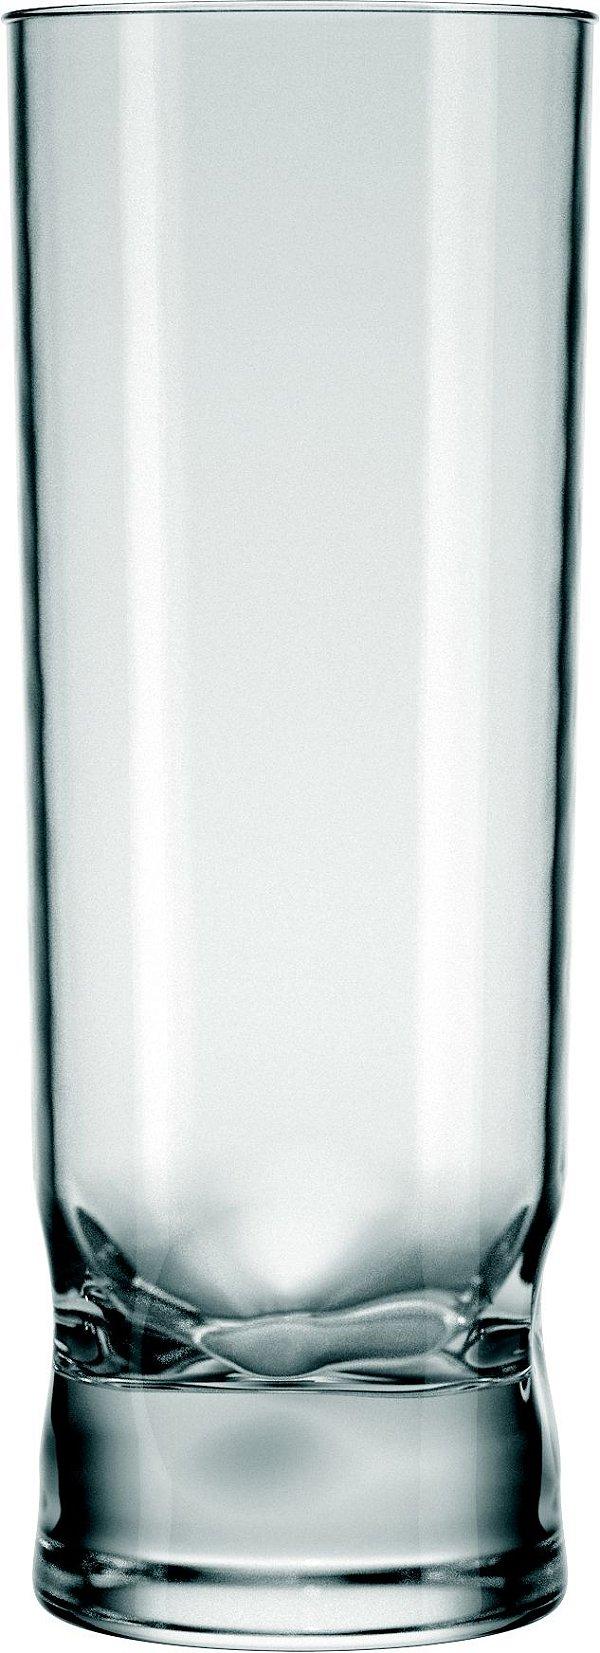 Copo Amassadinho Tubo 290ml Caixa C/ 12 Unidades